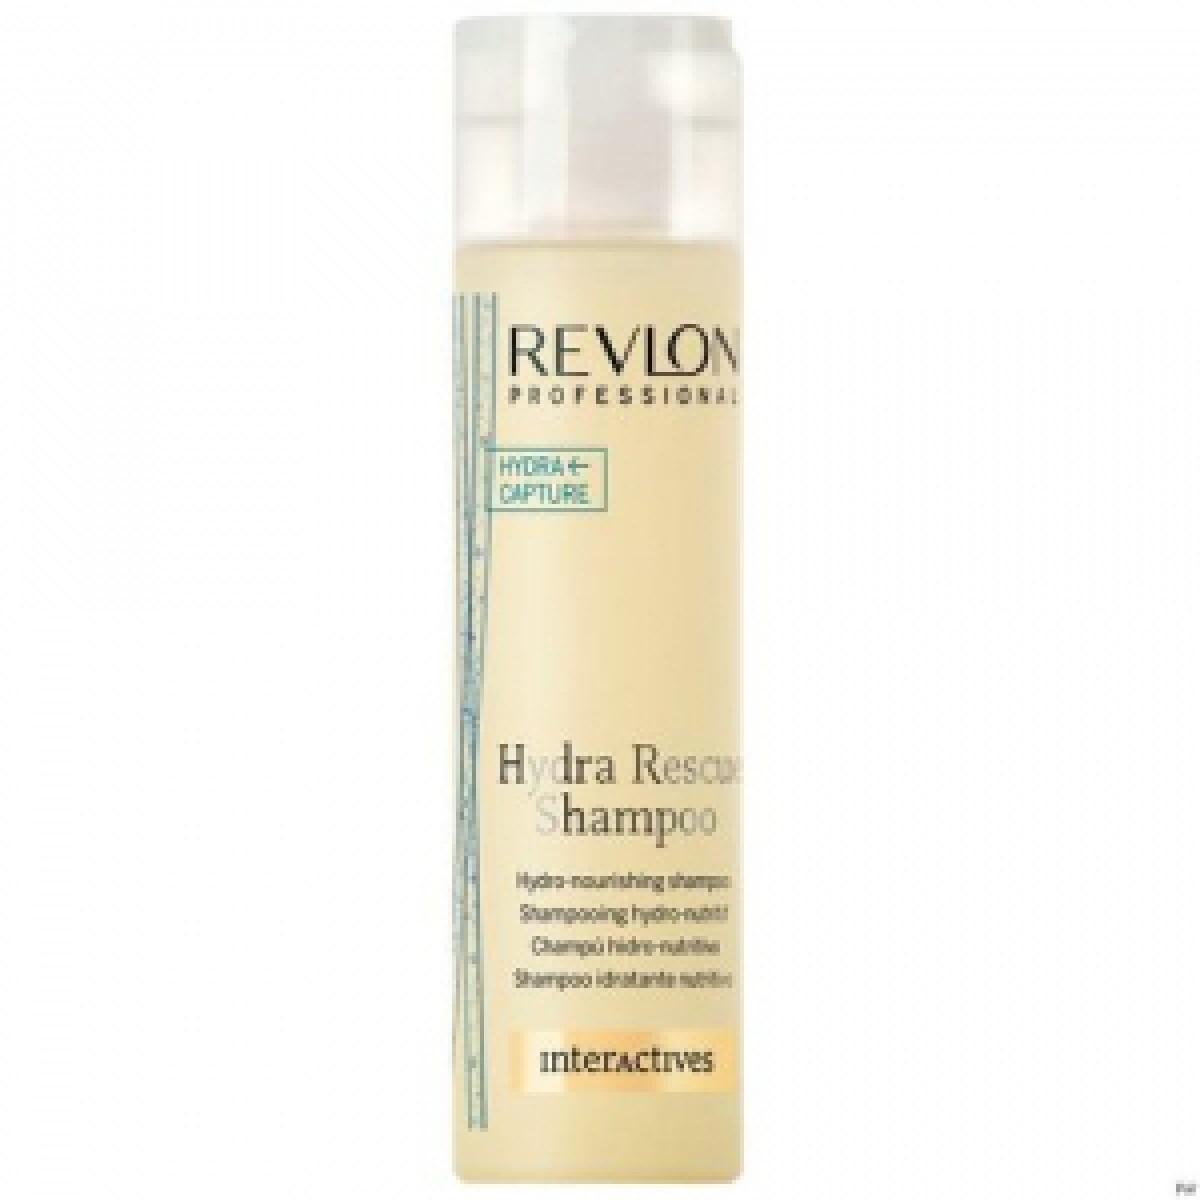 REVLON PROFESSIONAL Hydra Rescue Shampoo 250ml